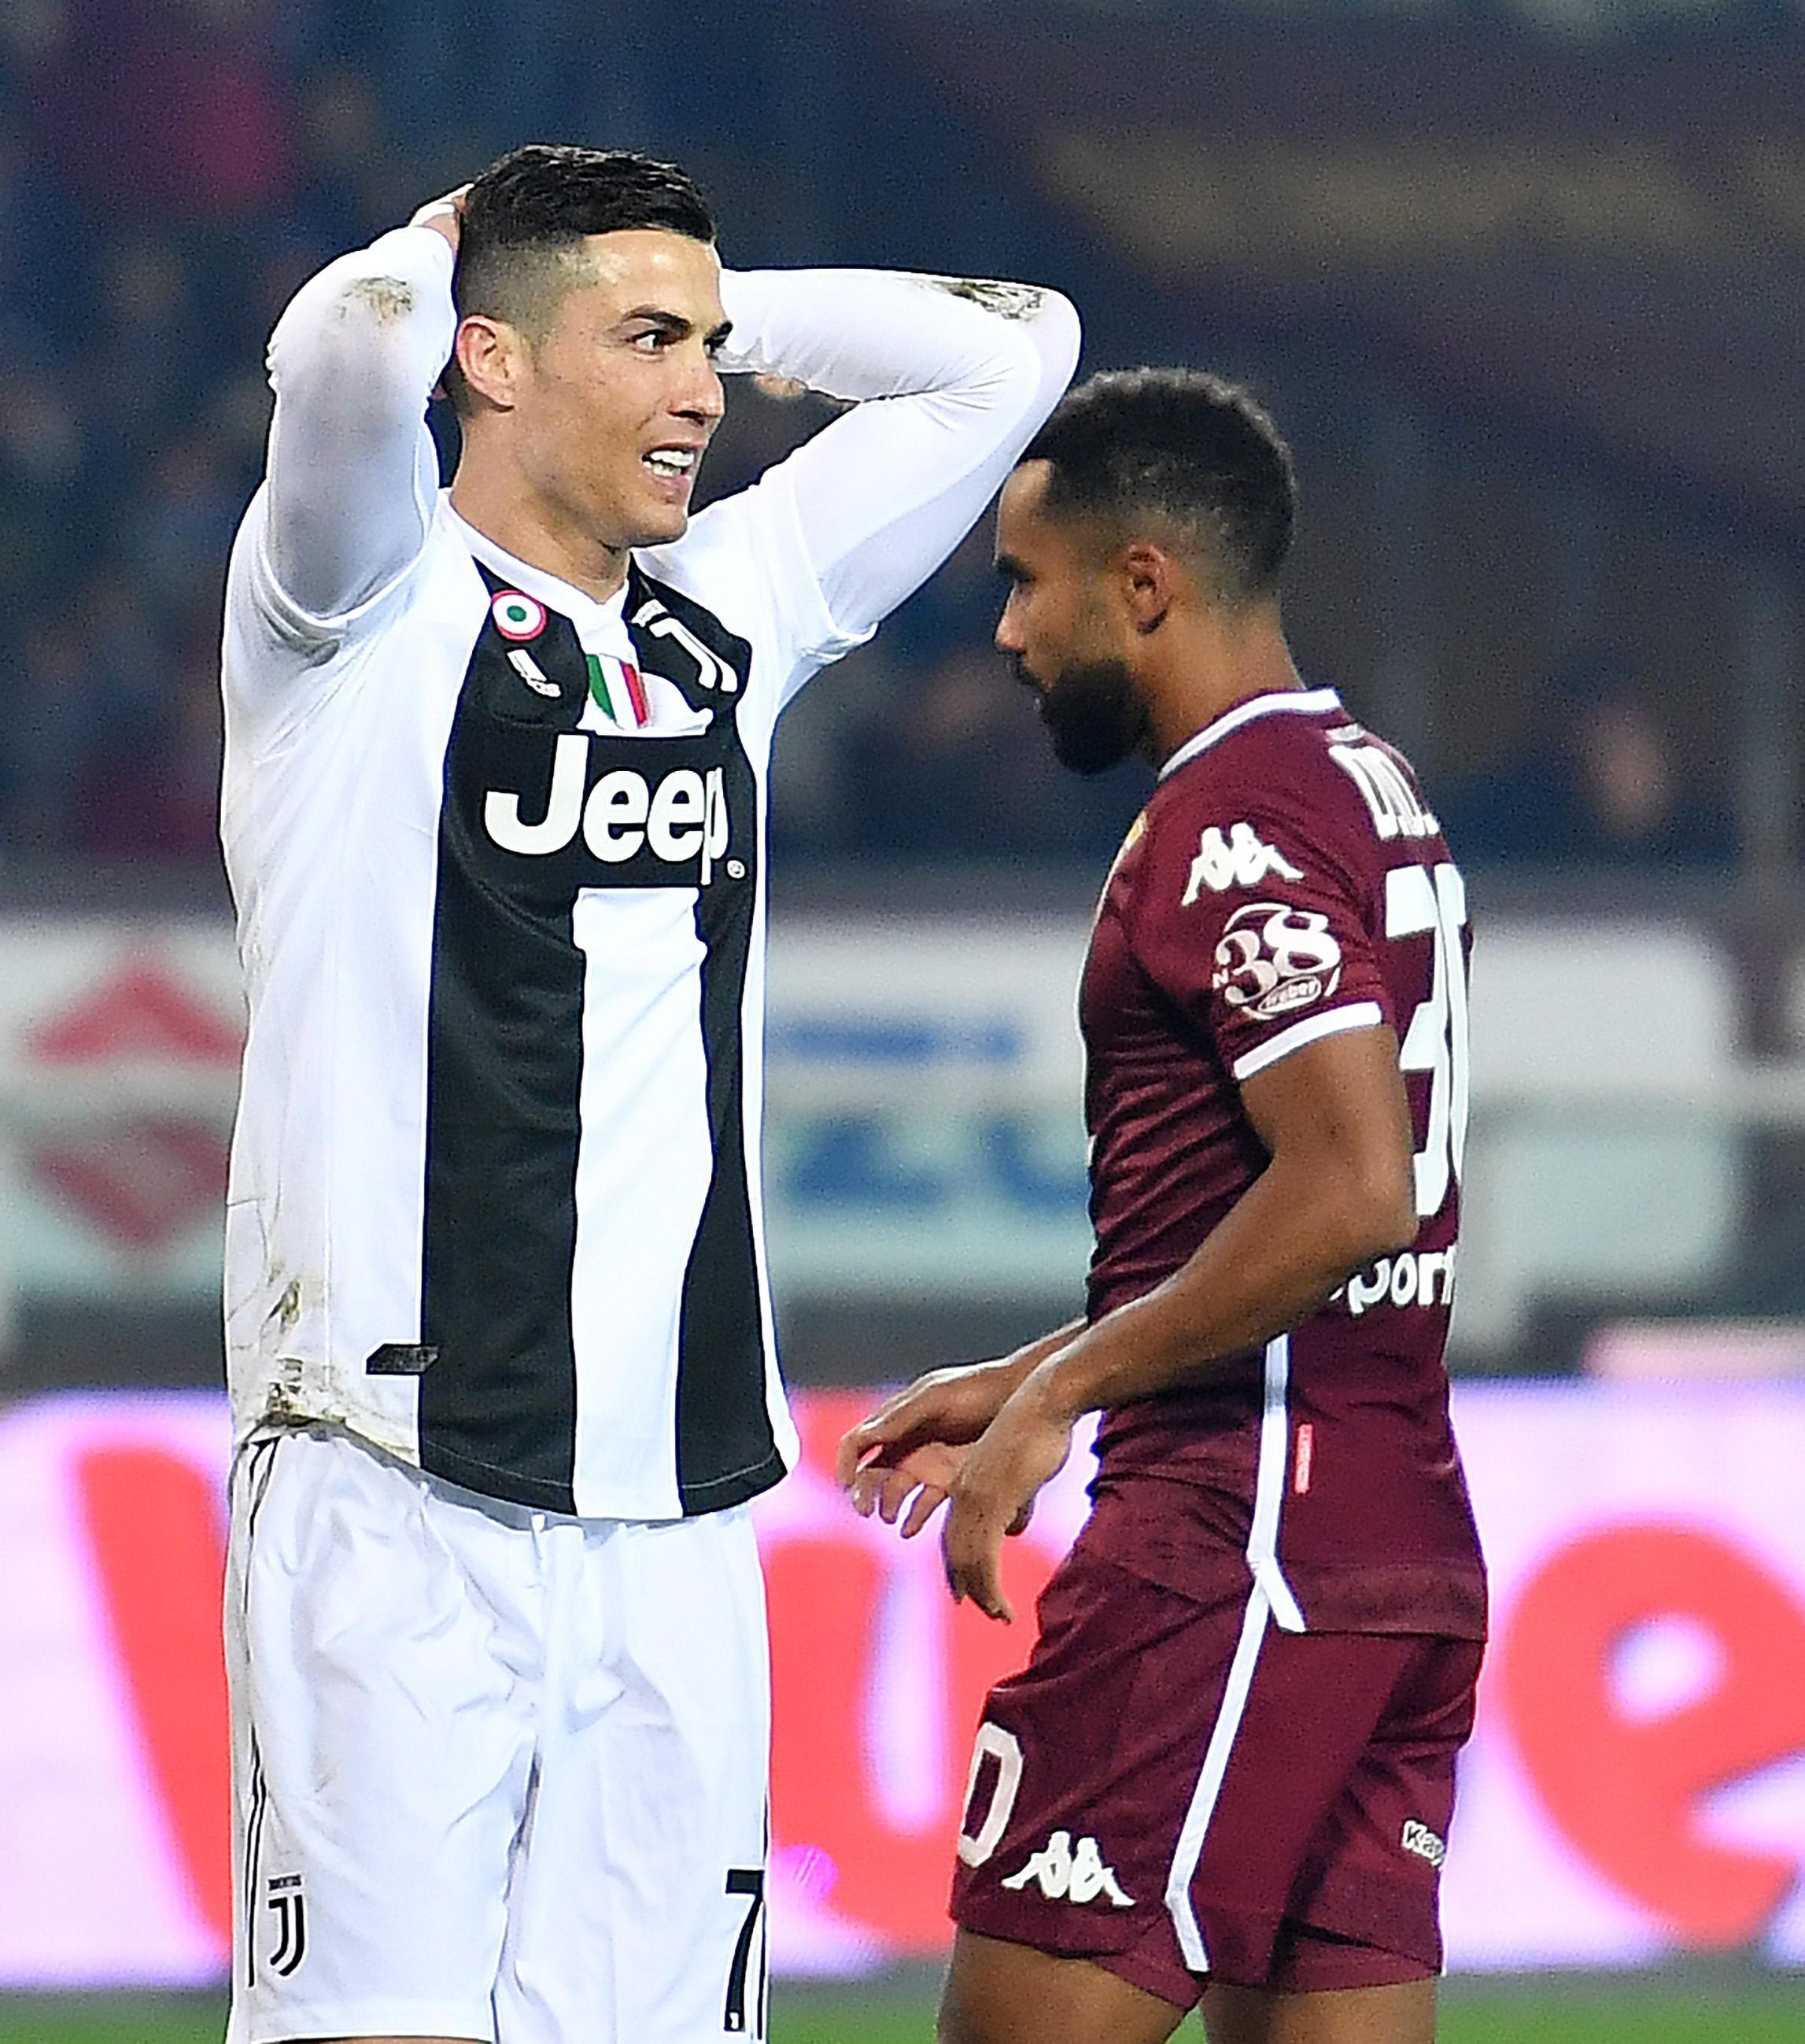 Ronaldo had a mixed night as Juventus edged out Torino